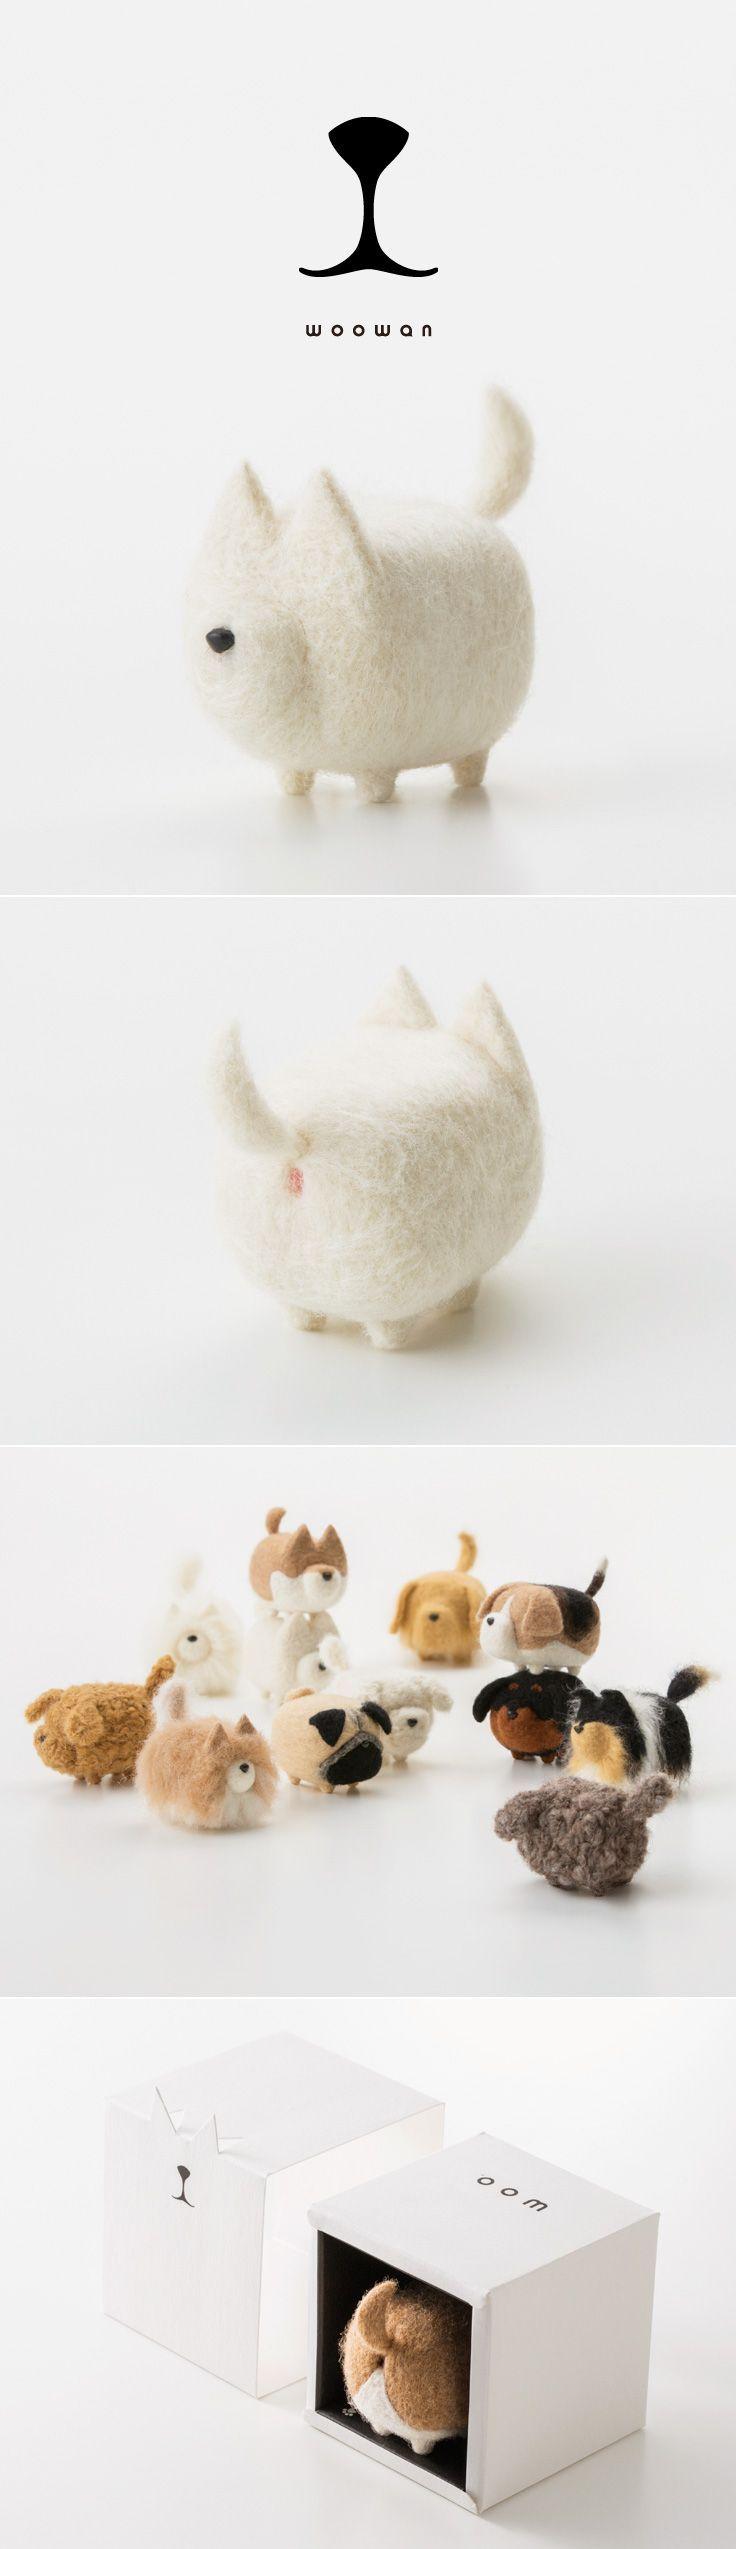 woowan/犬/dog/羊毛フェルト/Needle/Felting/mascot/doll/home/style/products/art/design